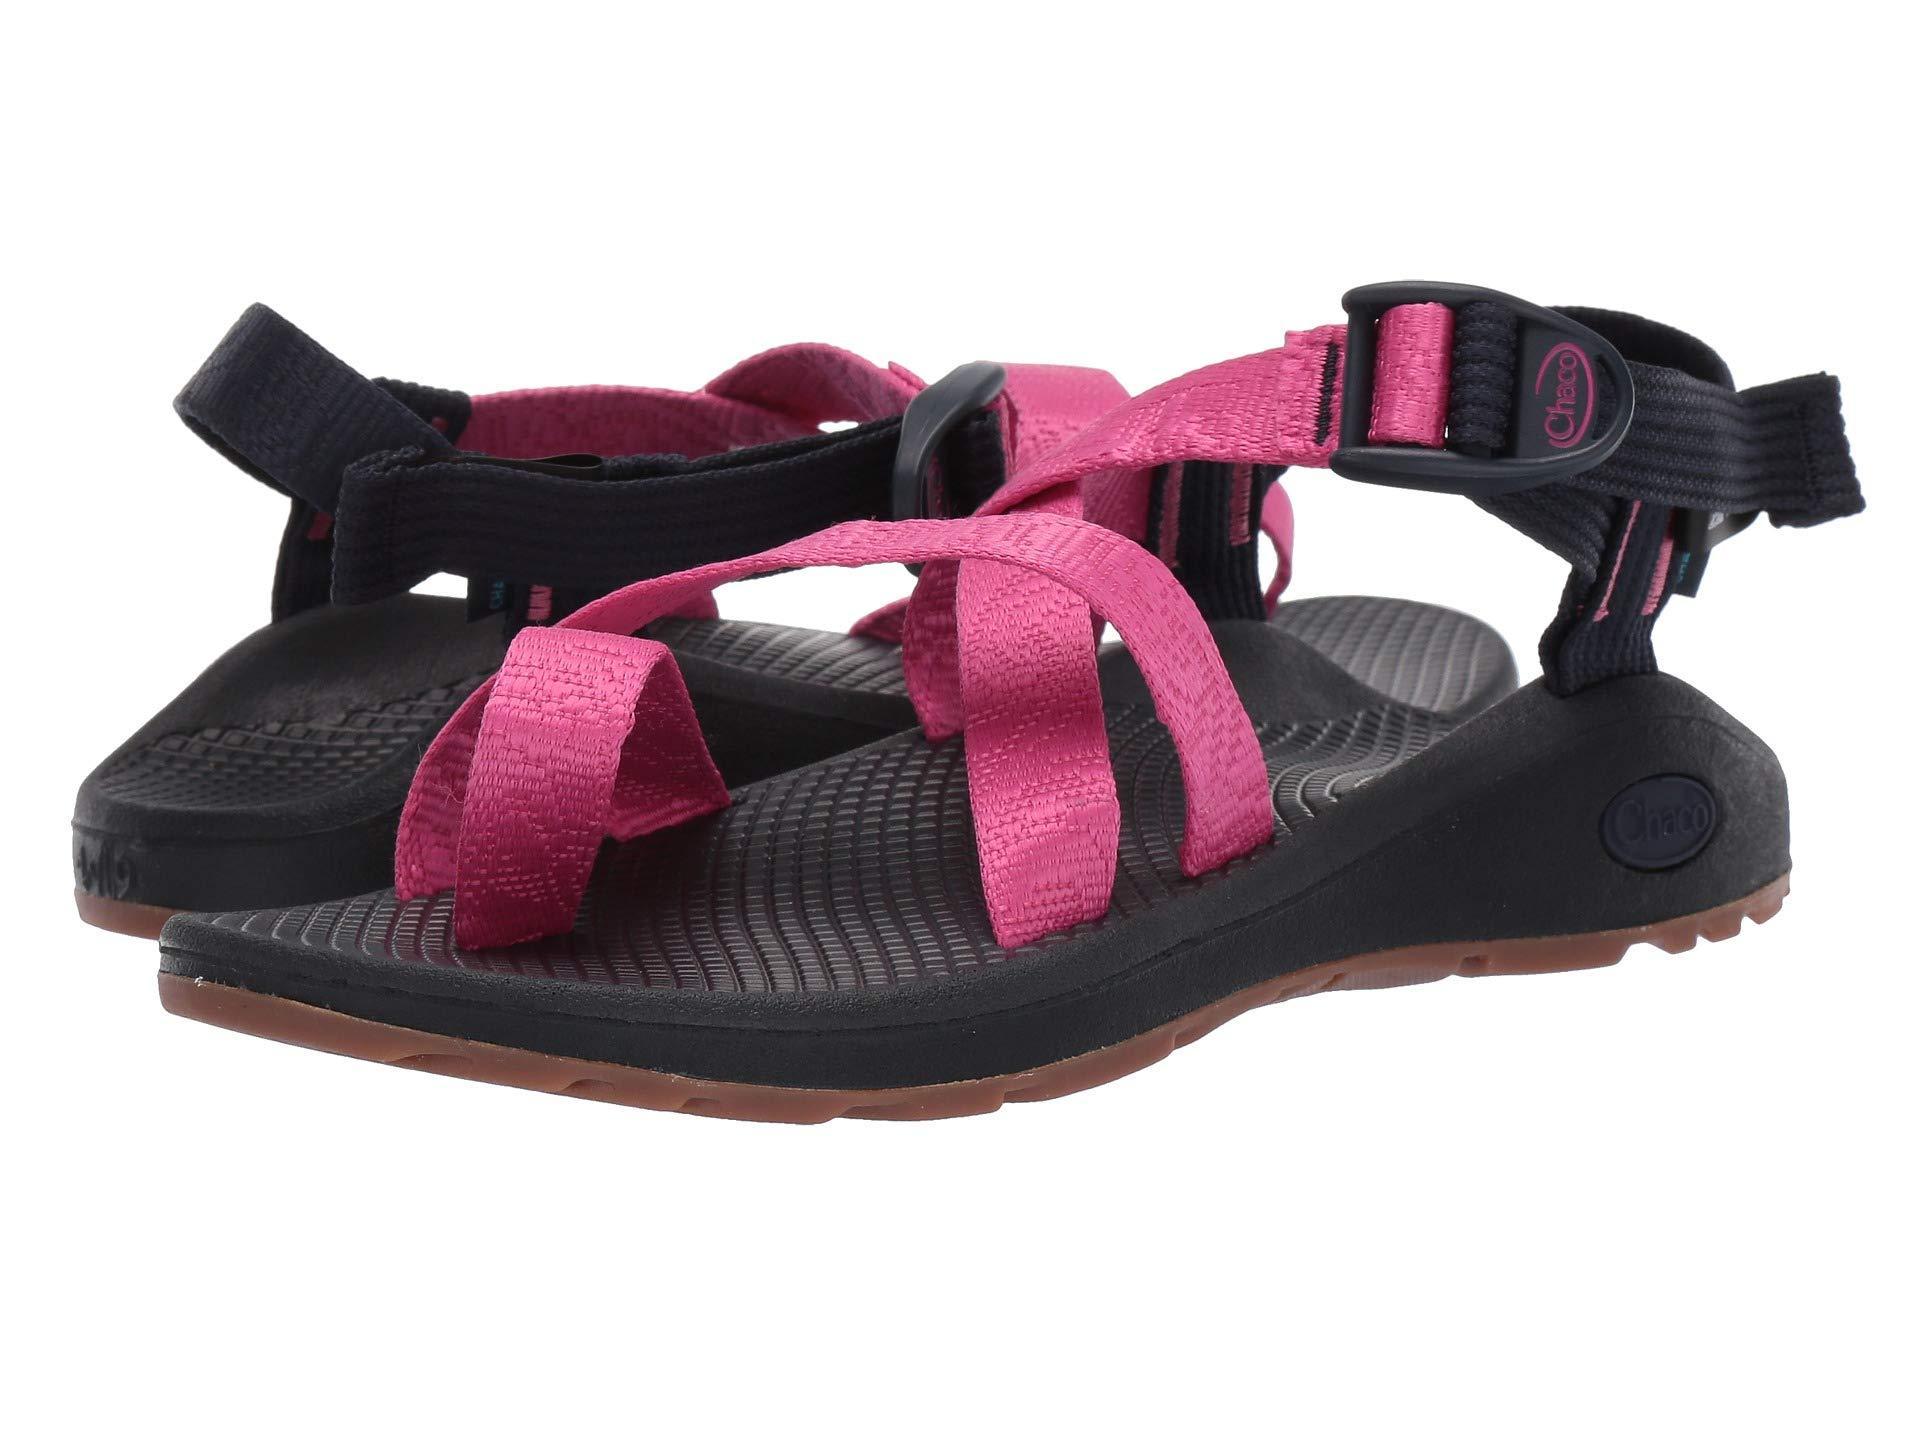 541499194c08 Lyst - Chaco 30th Anniversary Z cloud 2 (magenta) Women s Sandals